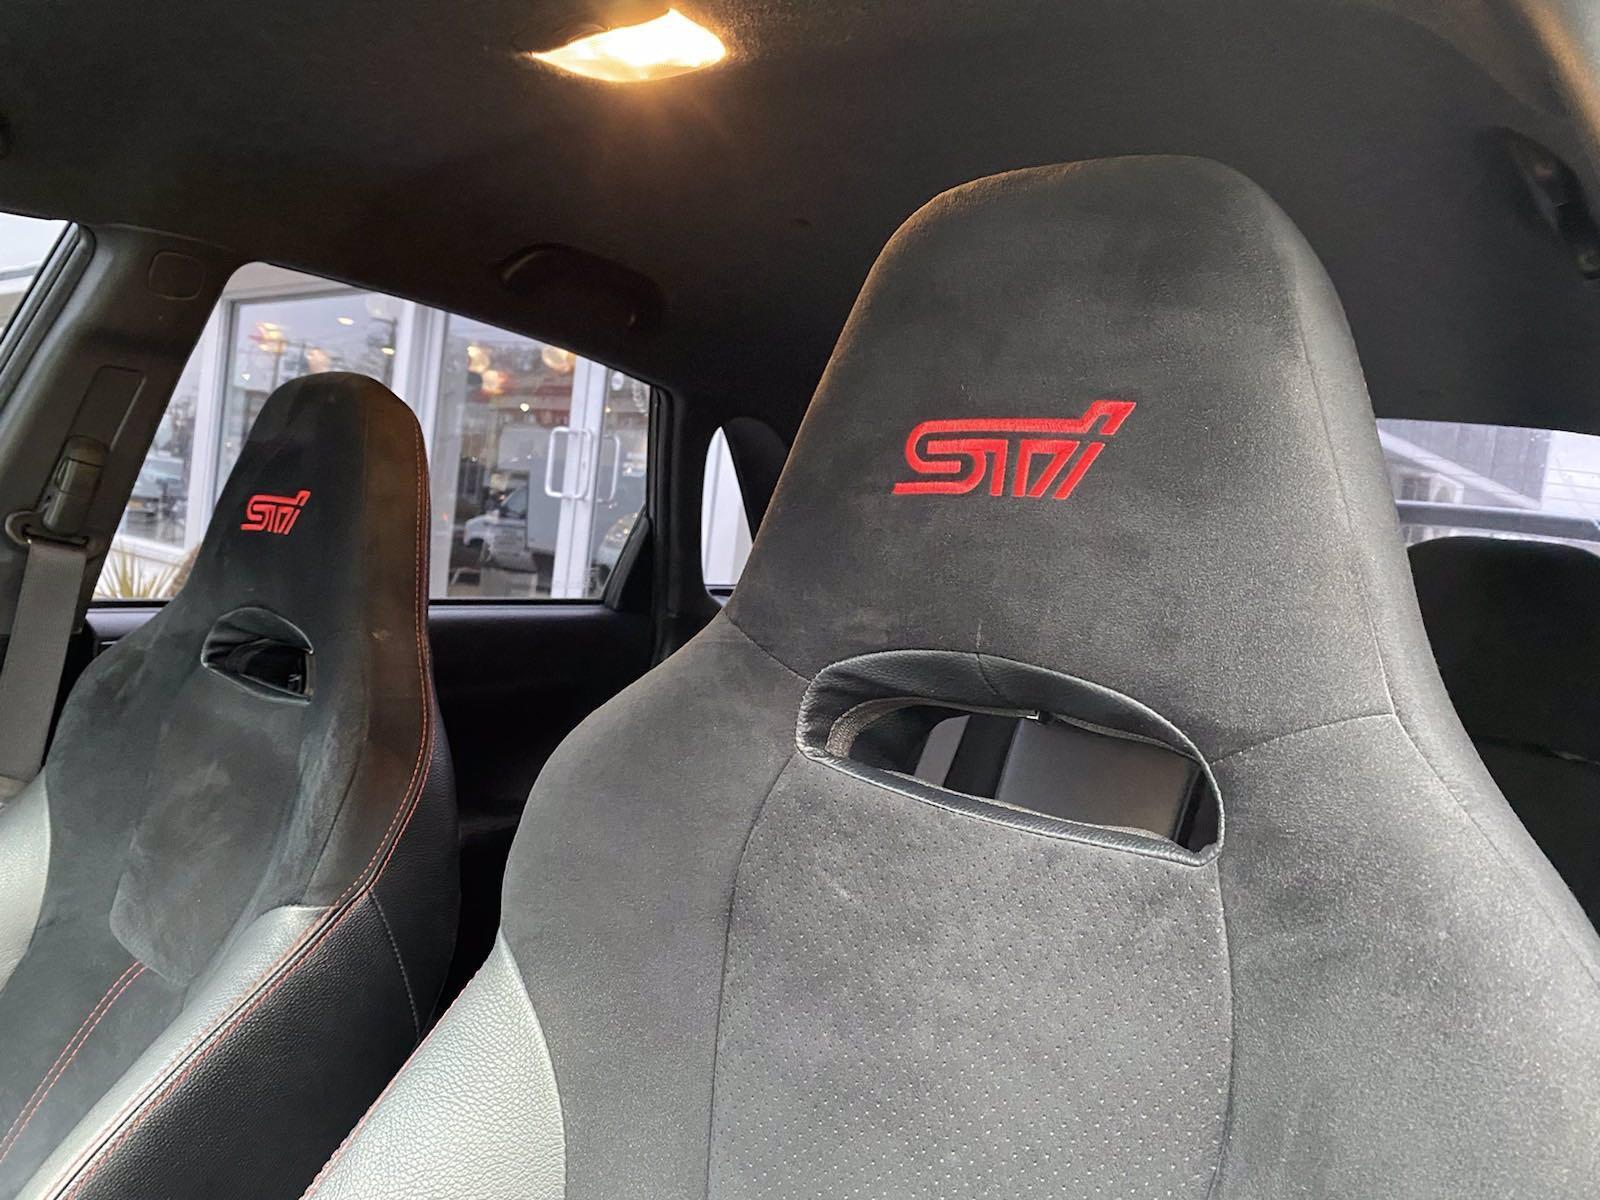 Used-2013-Subaru-Impreza-Sedan-WRX-WRX-STI